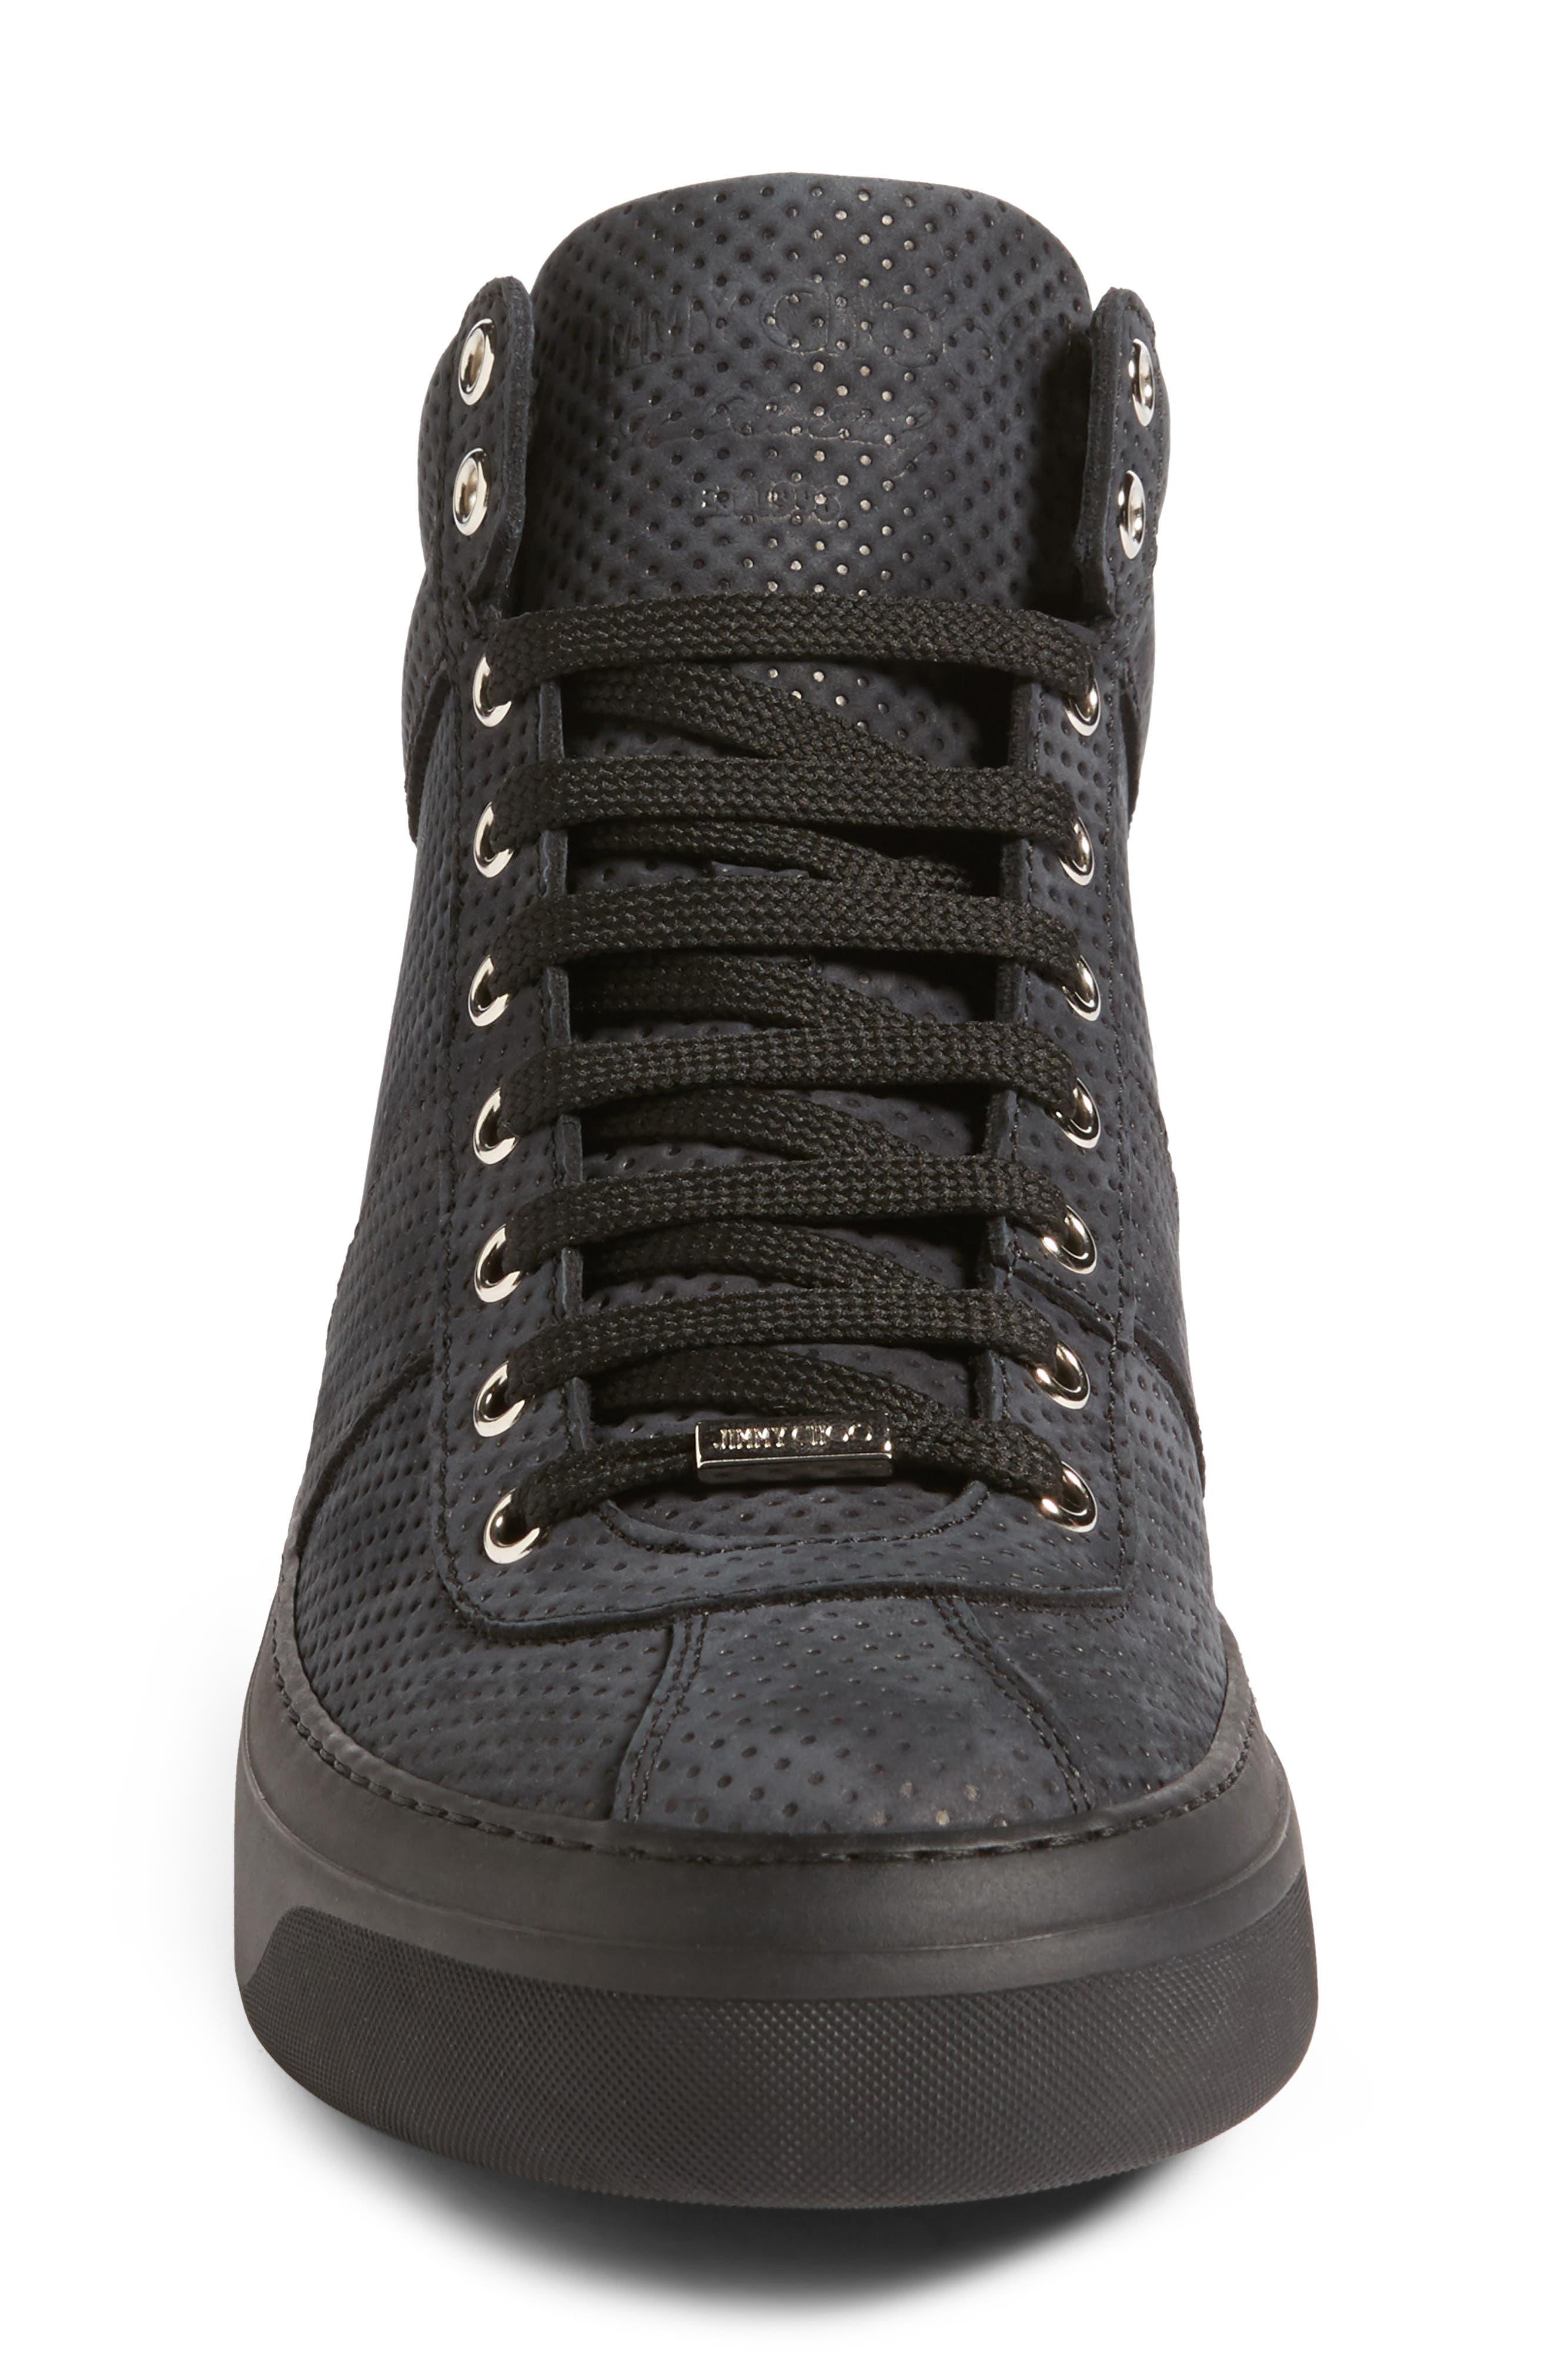 Belgravi Sneaker,                             Alternate thumbnail 4, color,                             Black/ Steel